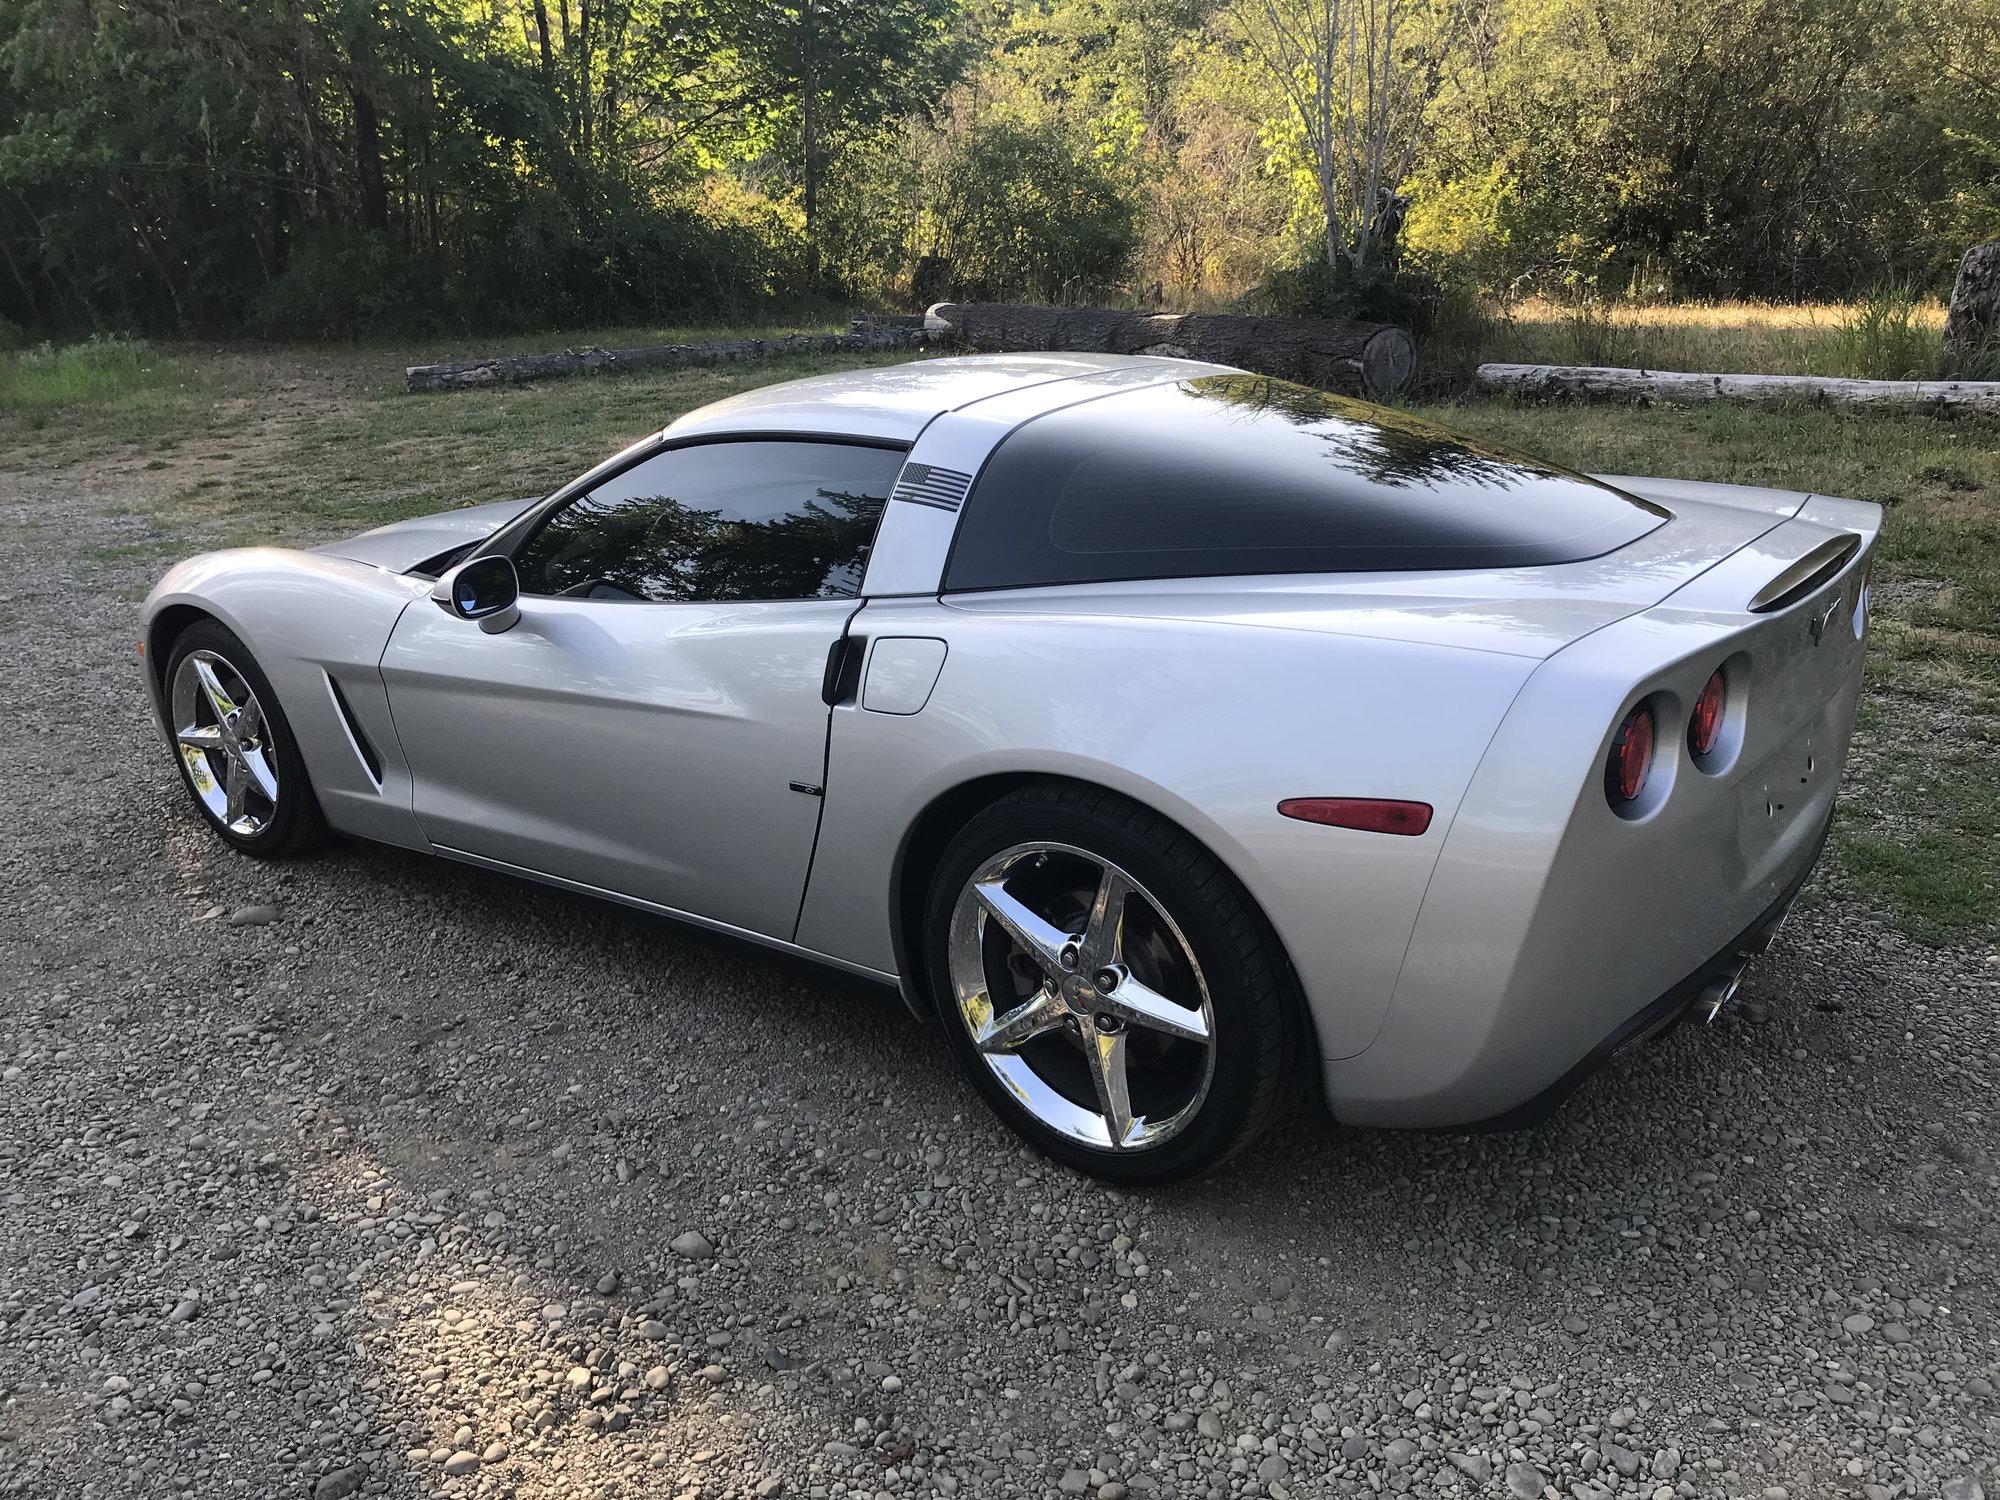 2005 convertible - Silver automatic - $22k - CorvetteForum